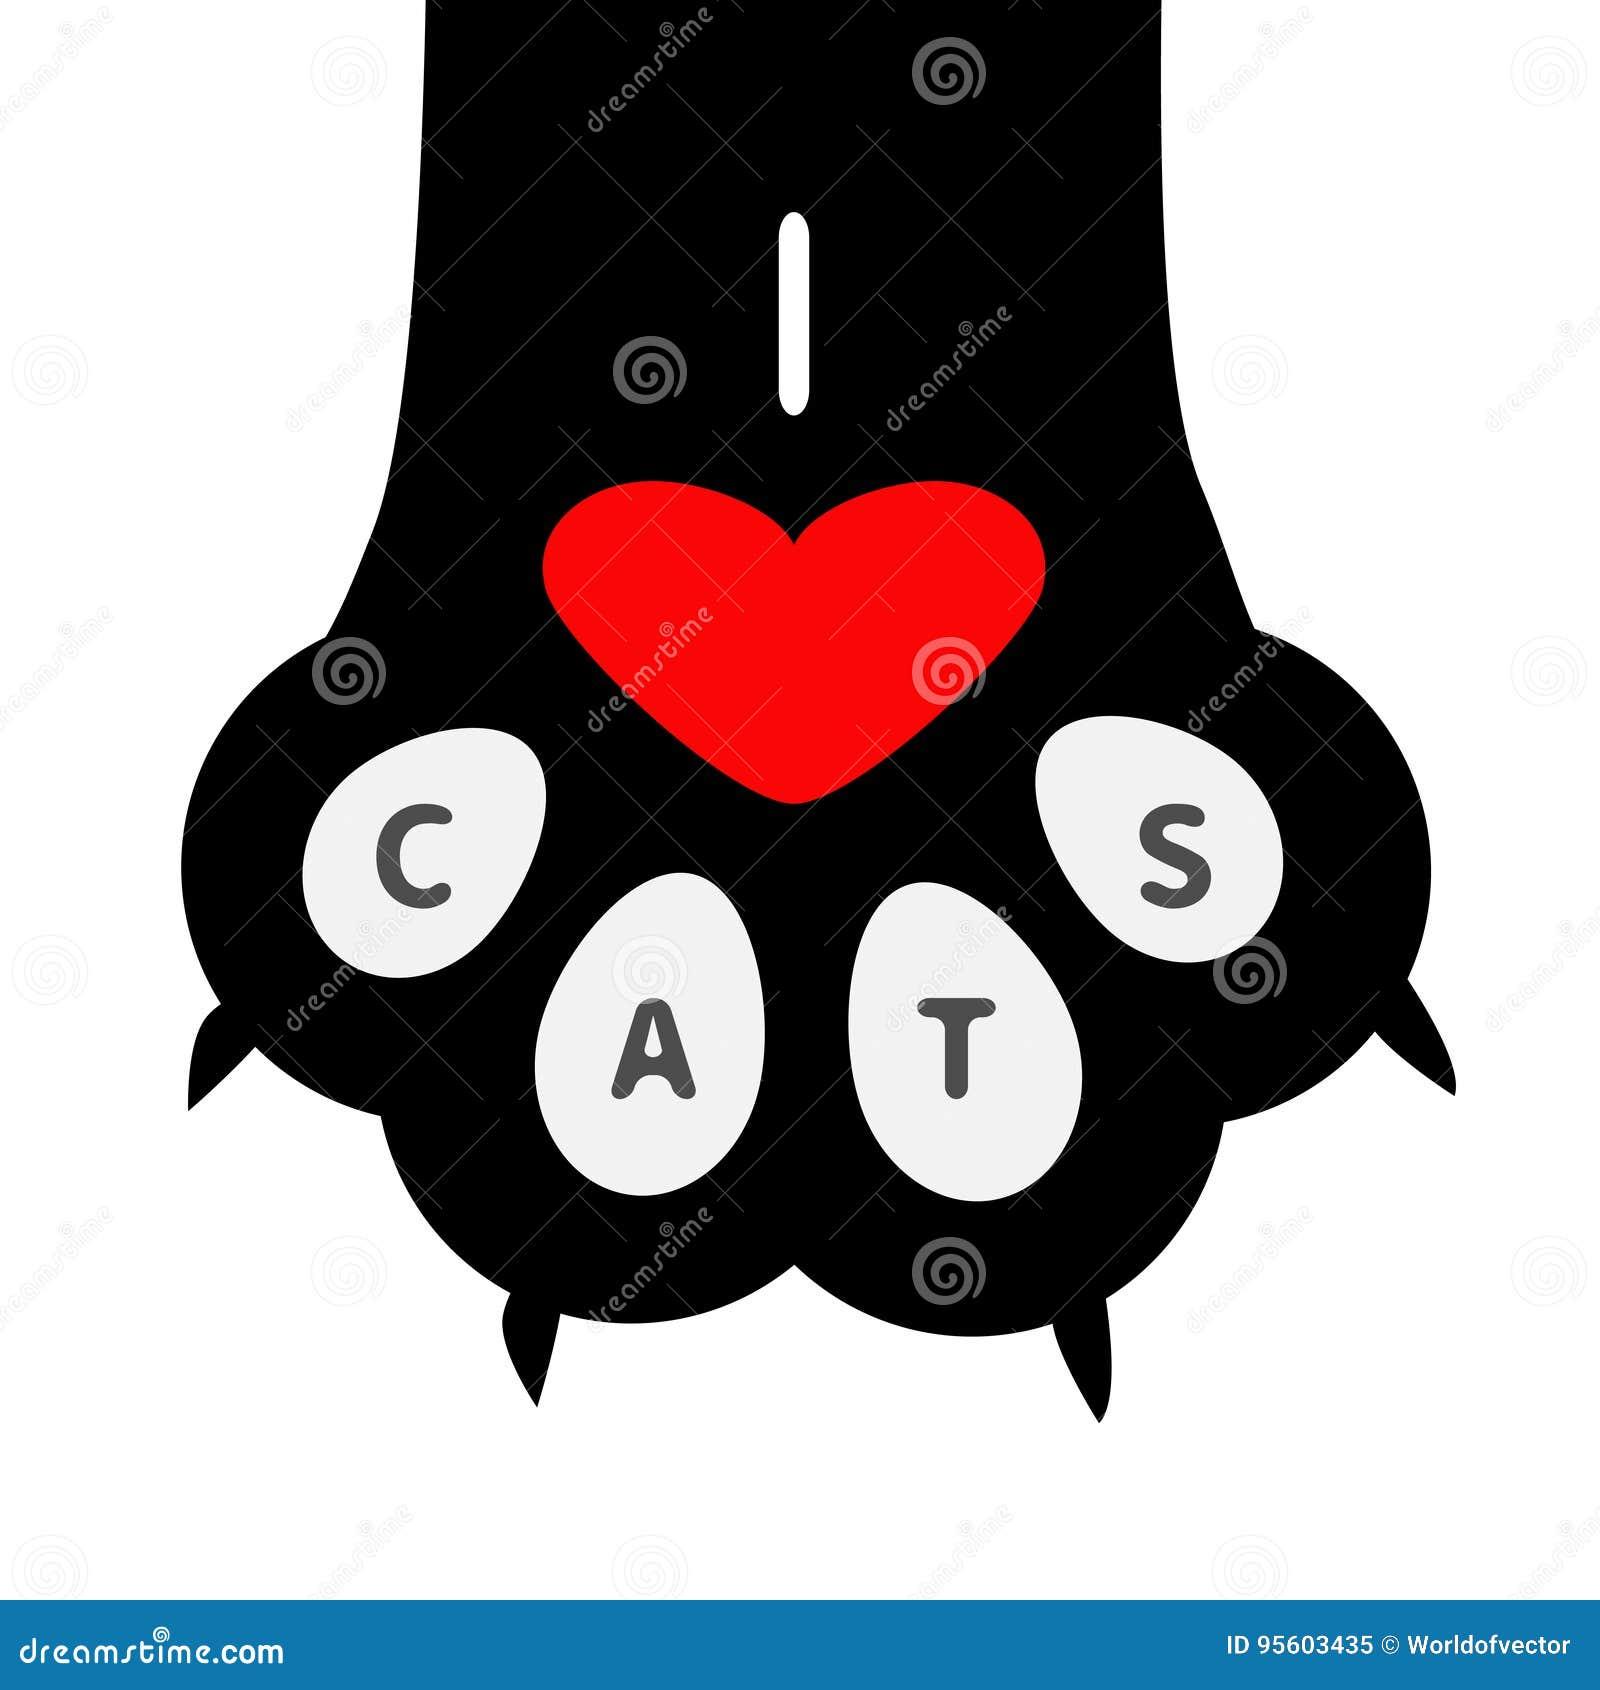 I love cats text big black cat paw print leg foot with nail claw i love cats text big black cat paw print leg foot with nail claw buycottarizona Image collections